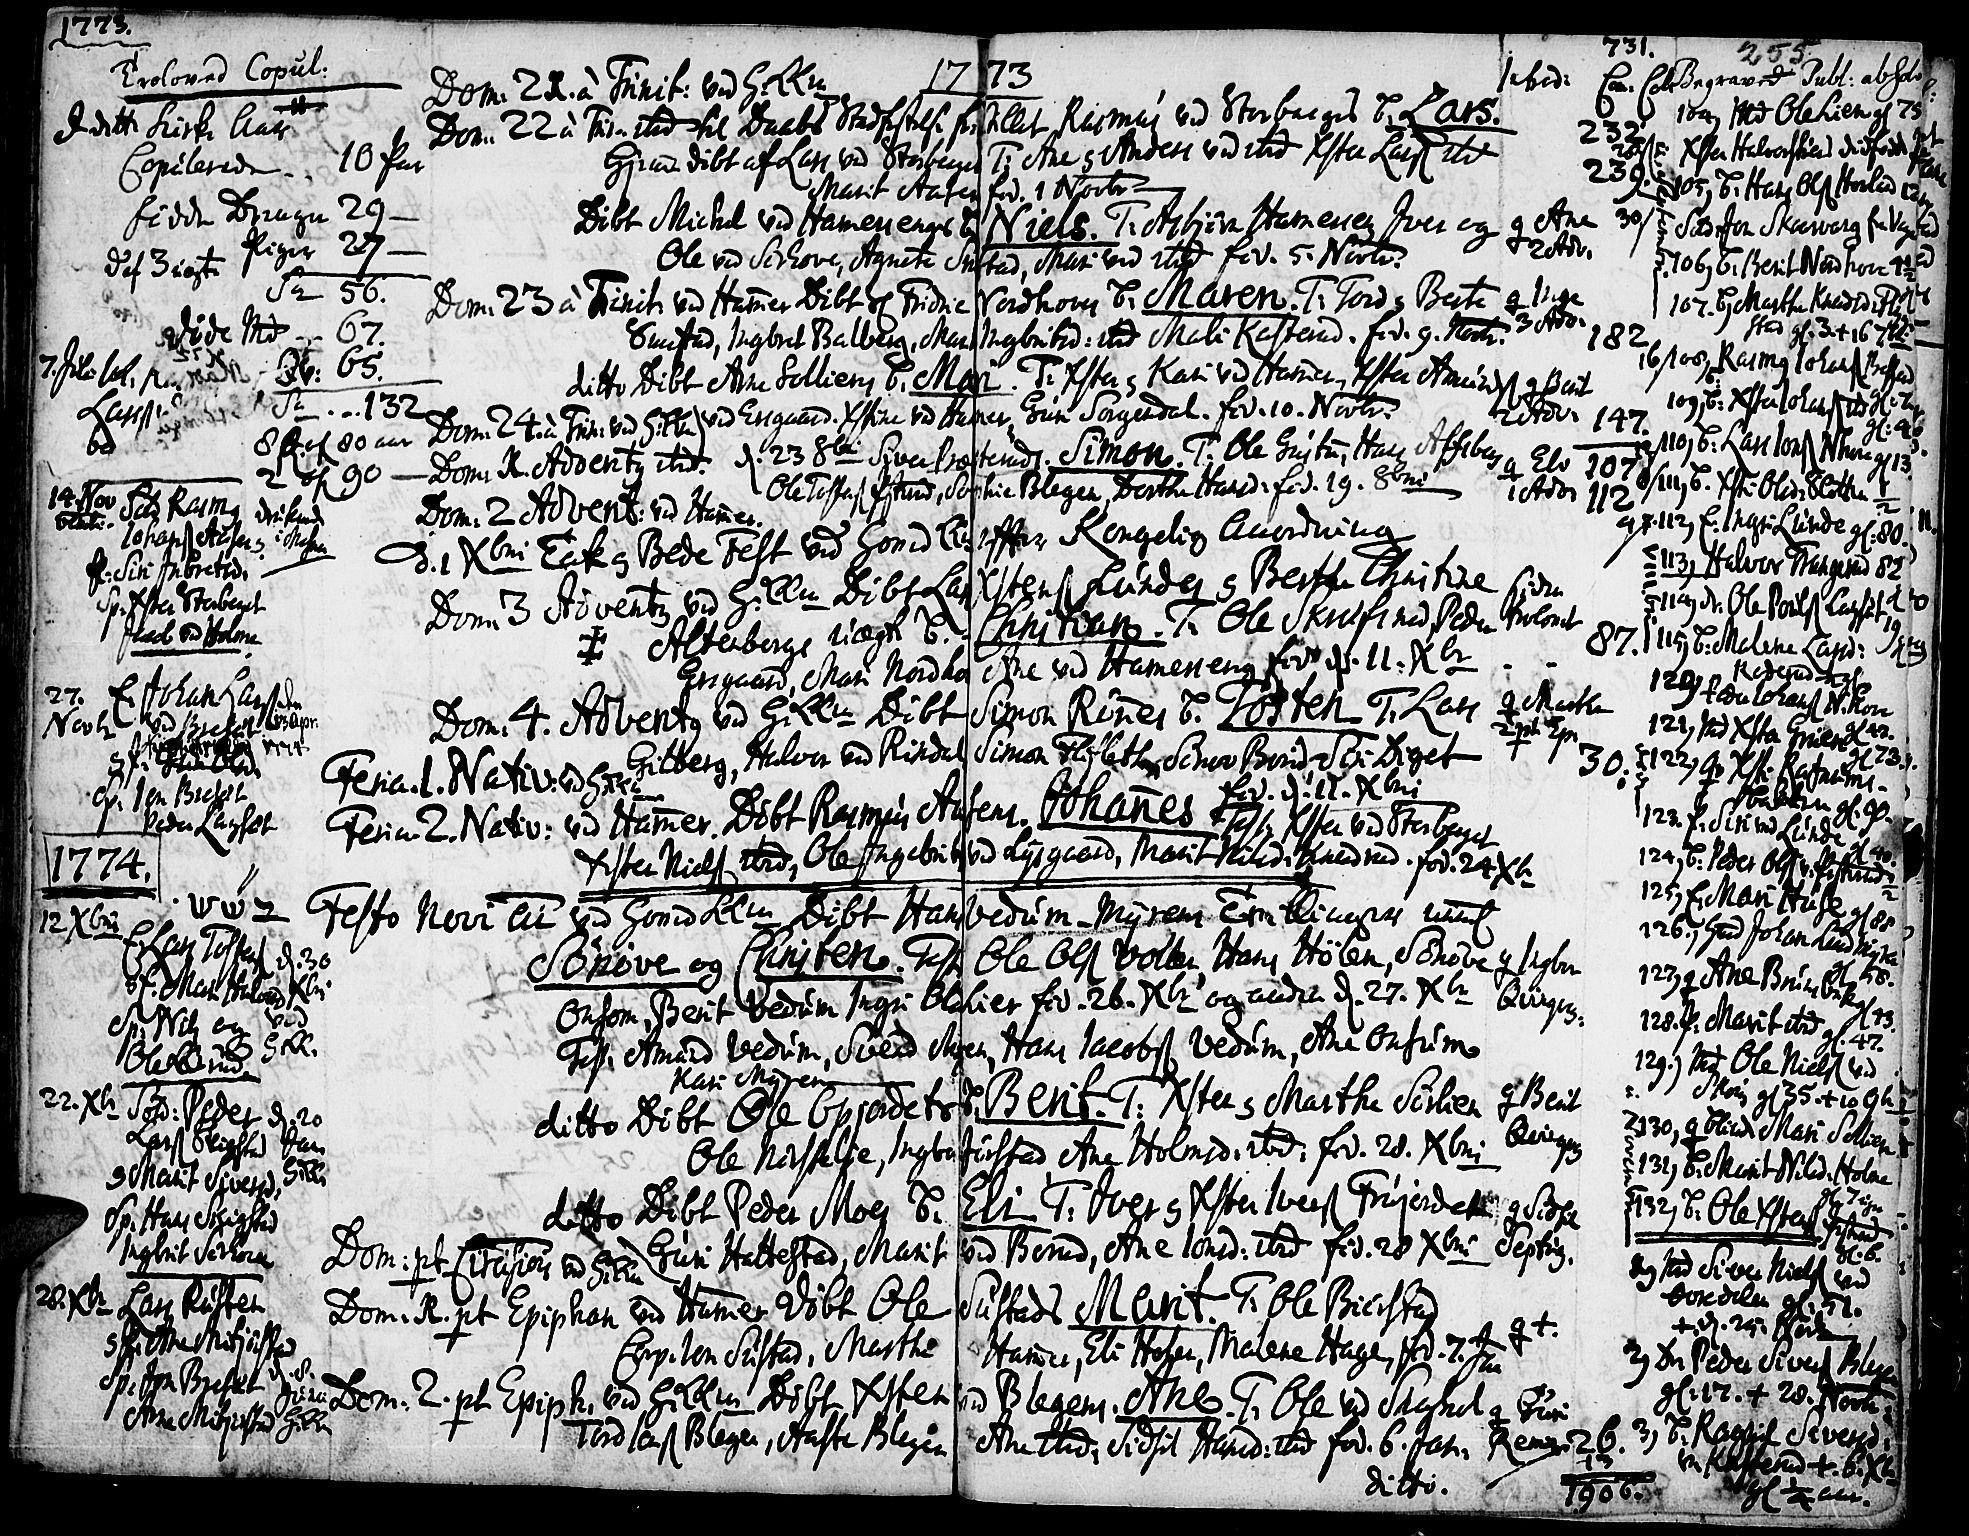 SAH, Fåberg prestekontor, Ministerialbok nr. 1, 1727-1775, s. 255